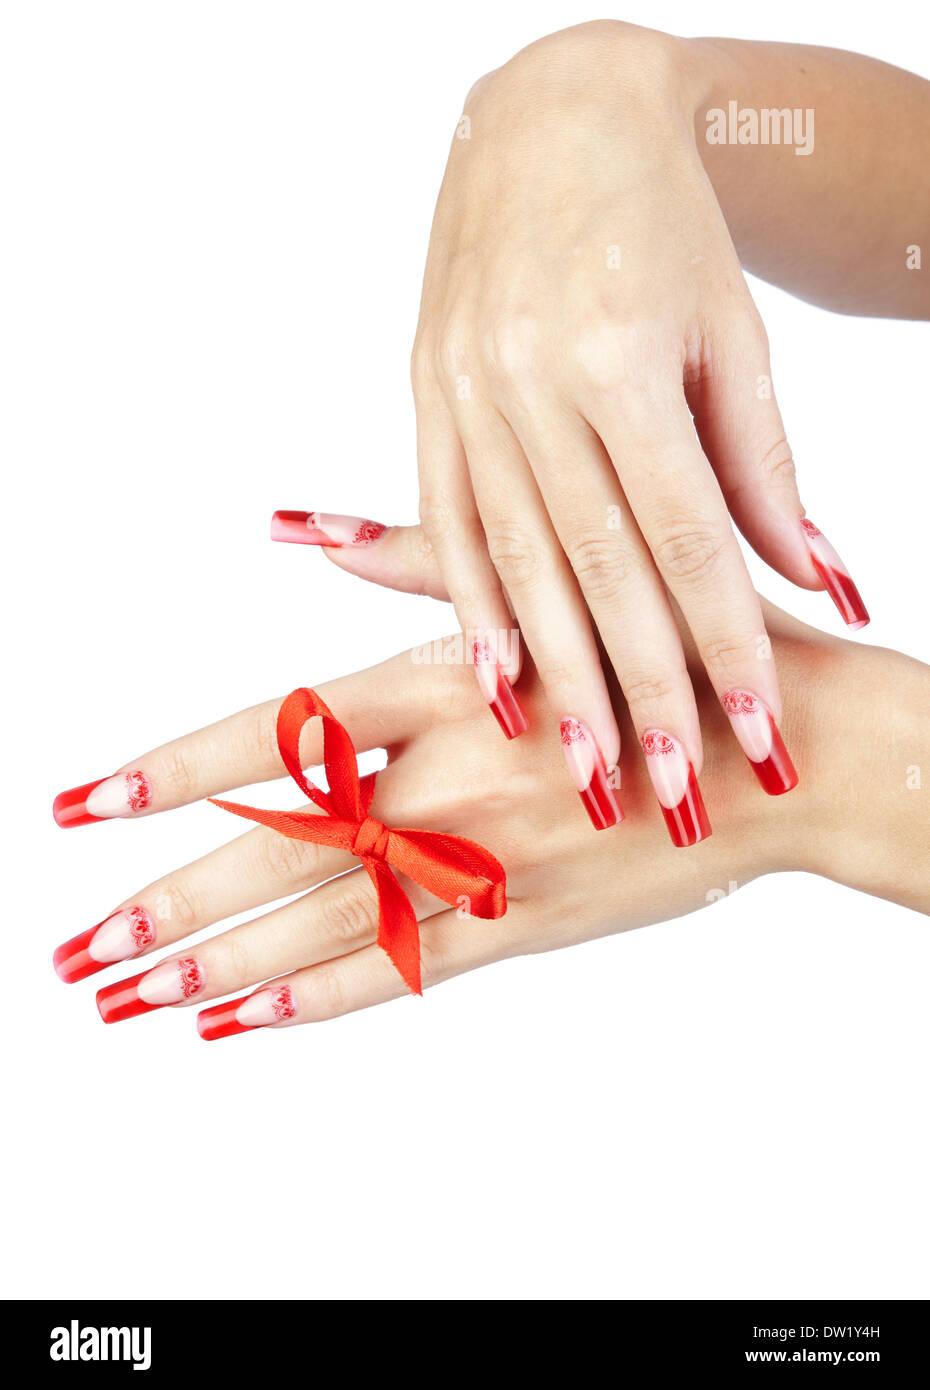 Long Finger Nails Stock Photos & Long Finger Nails Stock Images ...